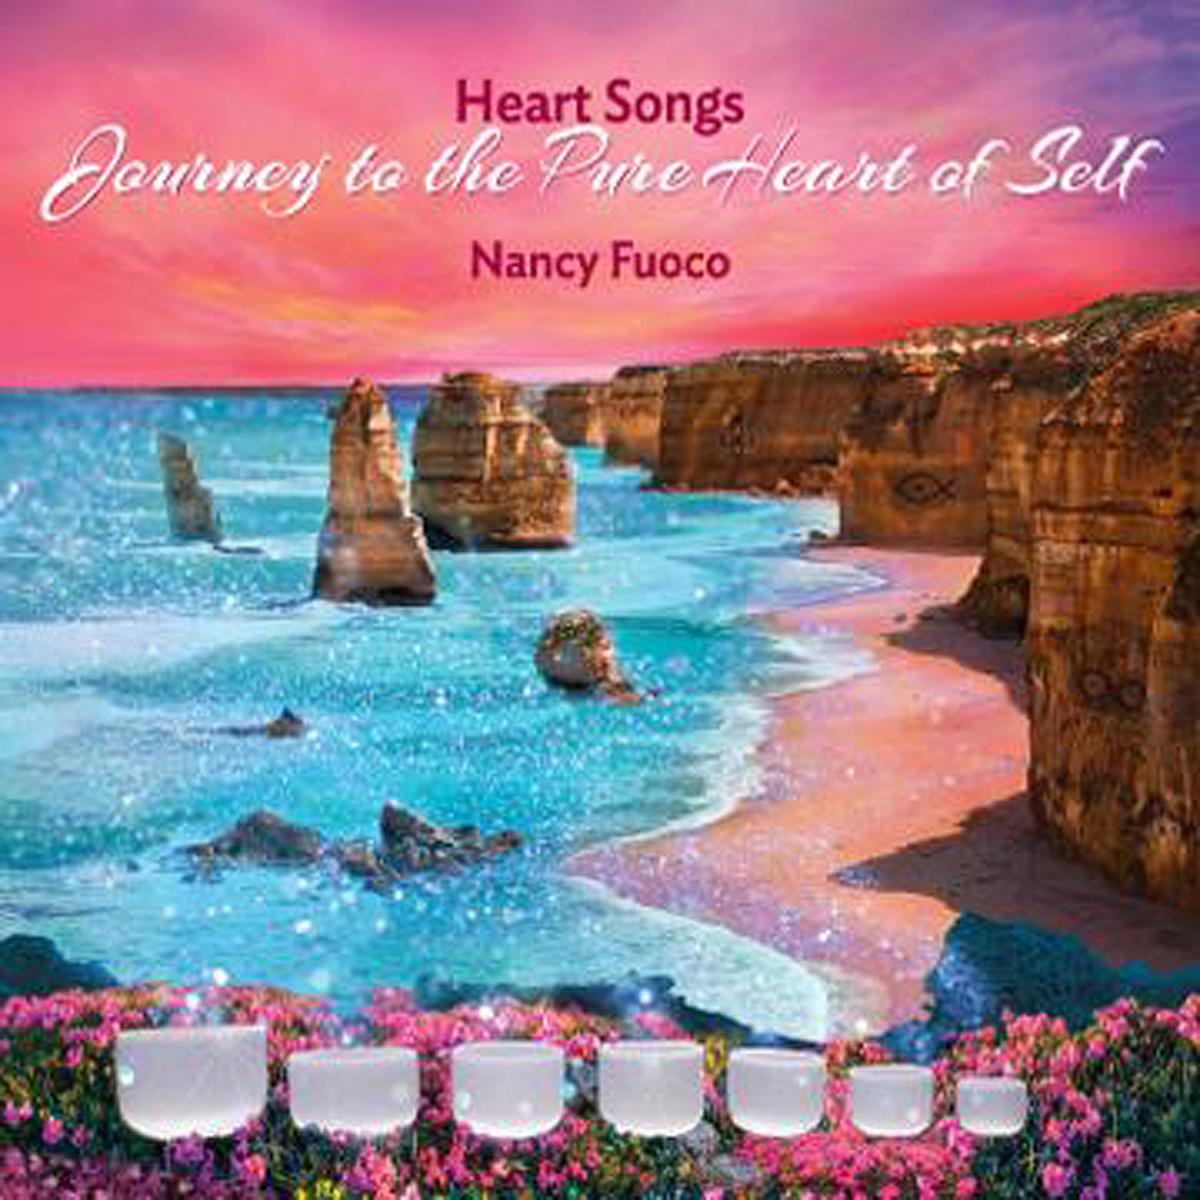 Nancy Fuoco – Heart Songs